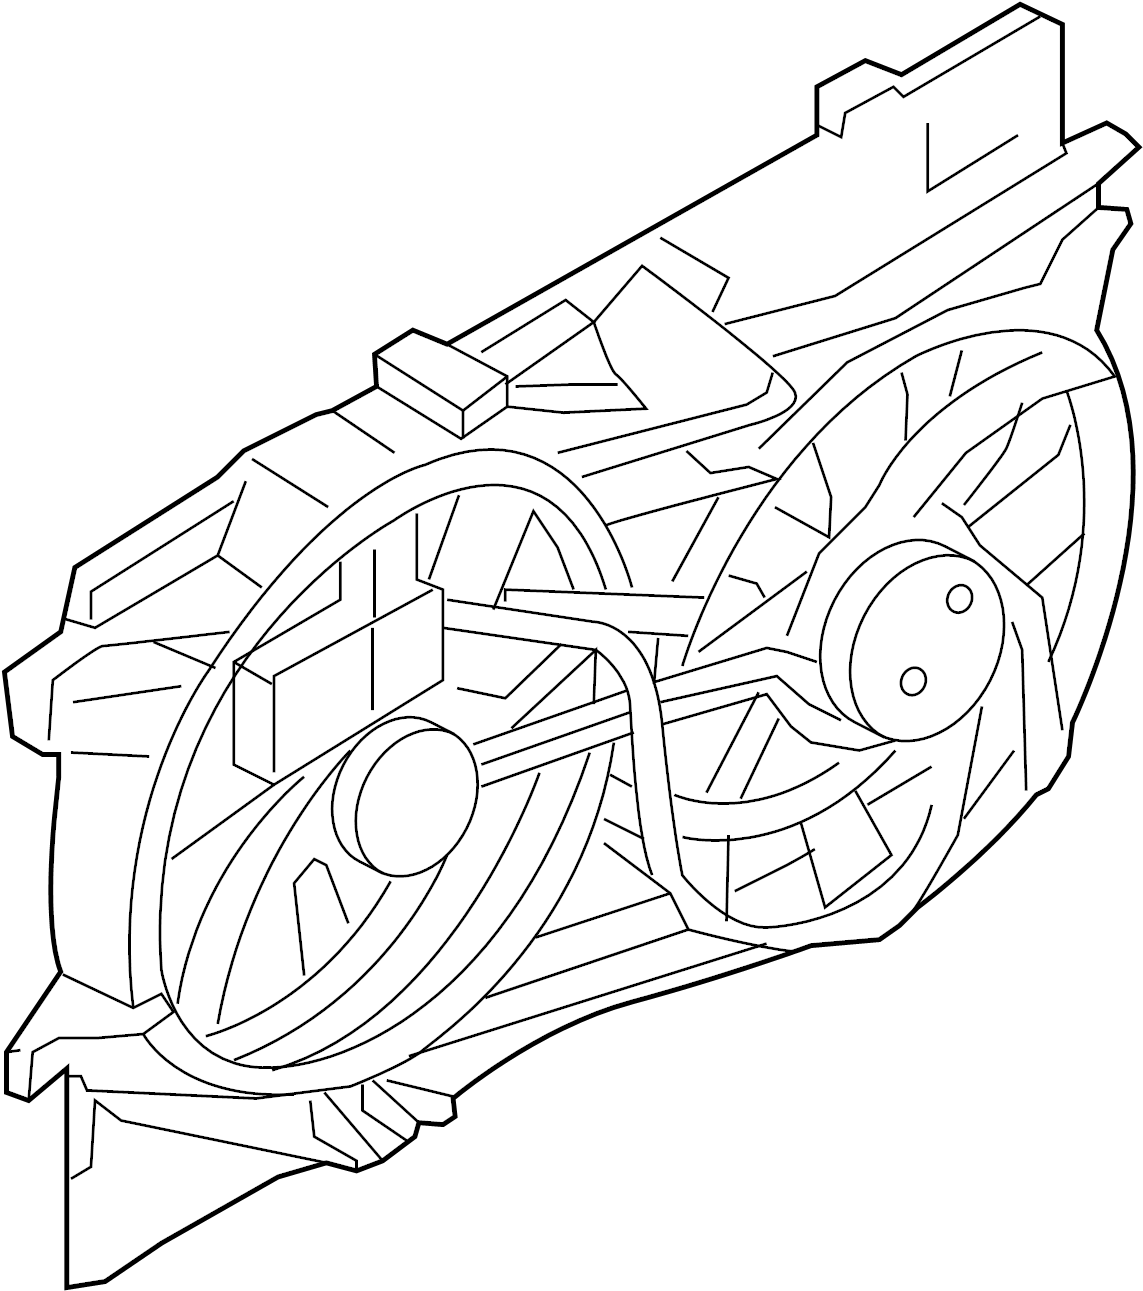 8a8z8c607a